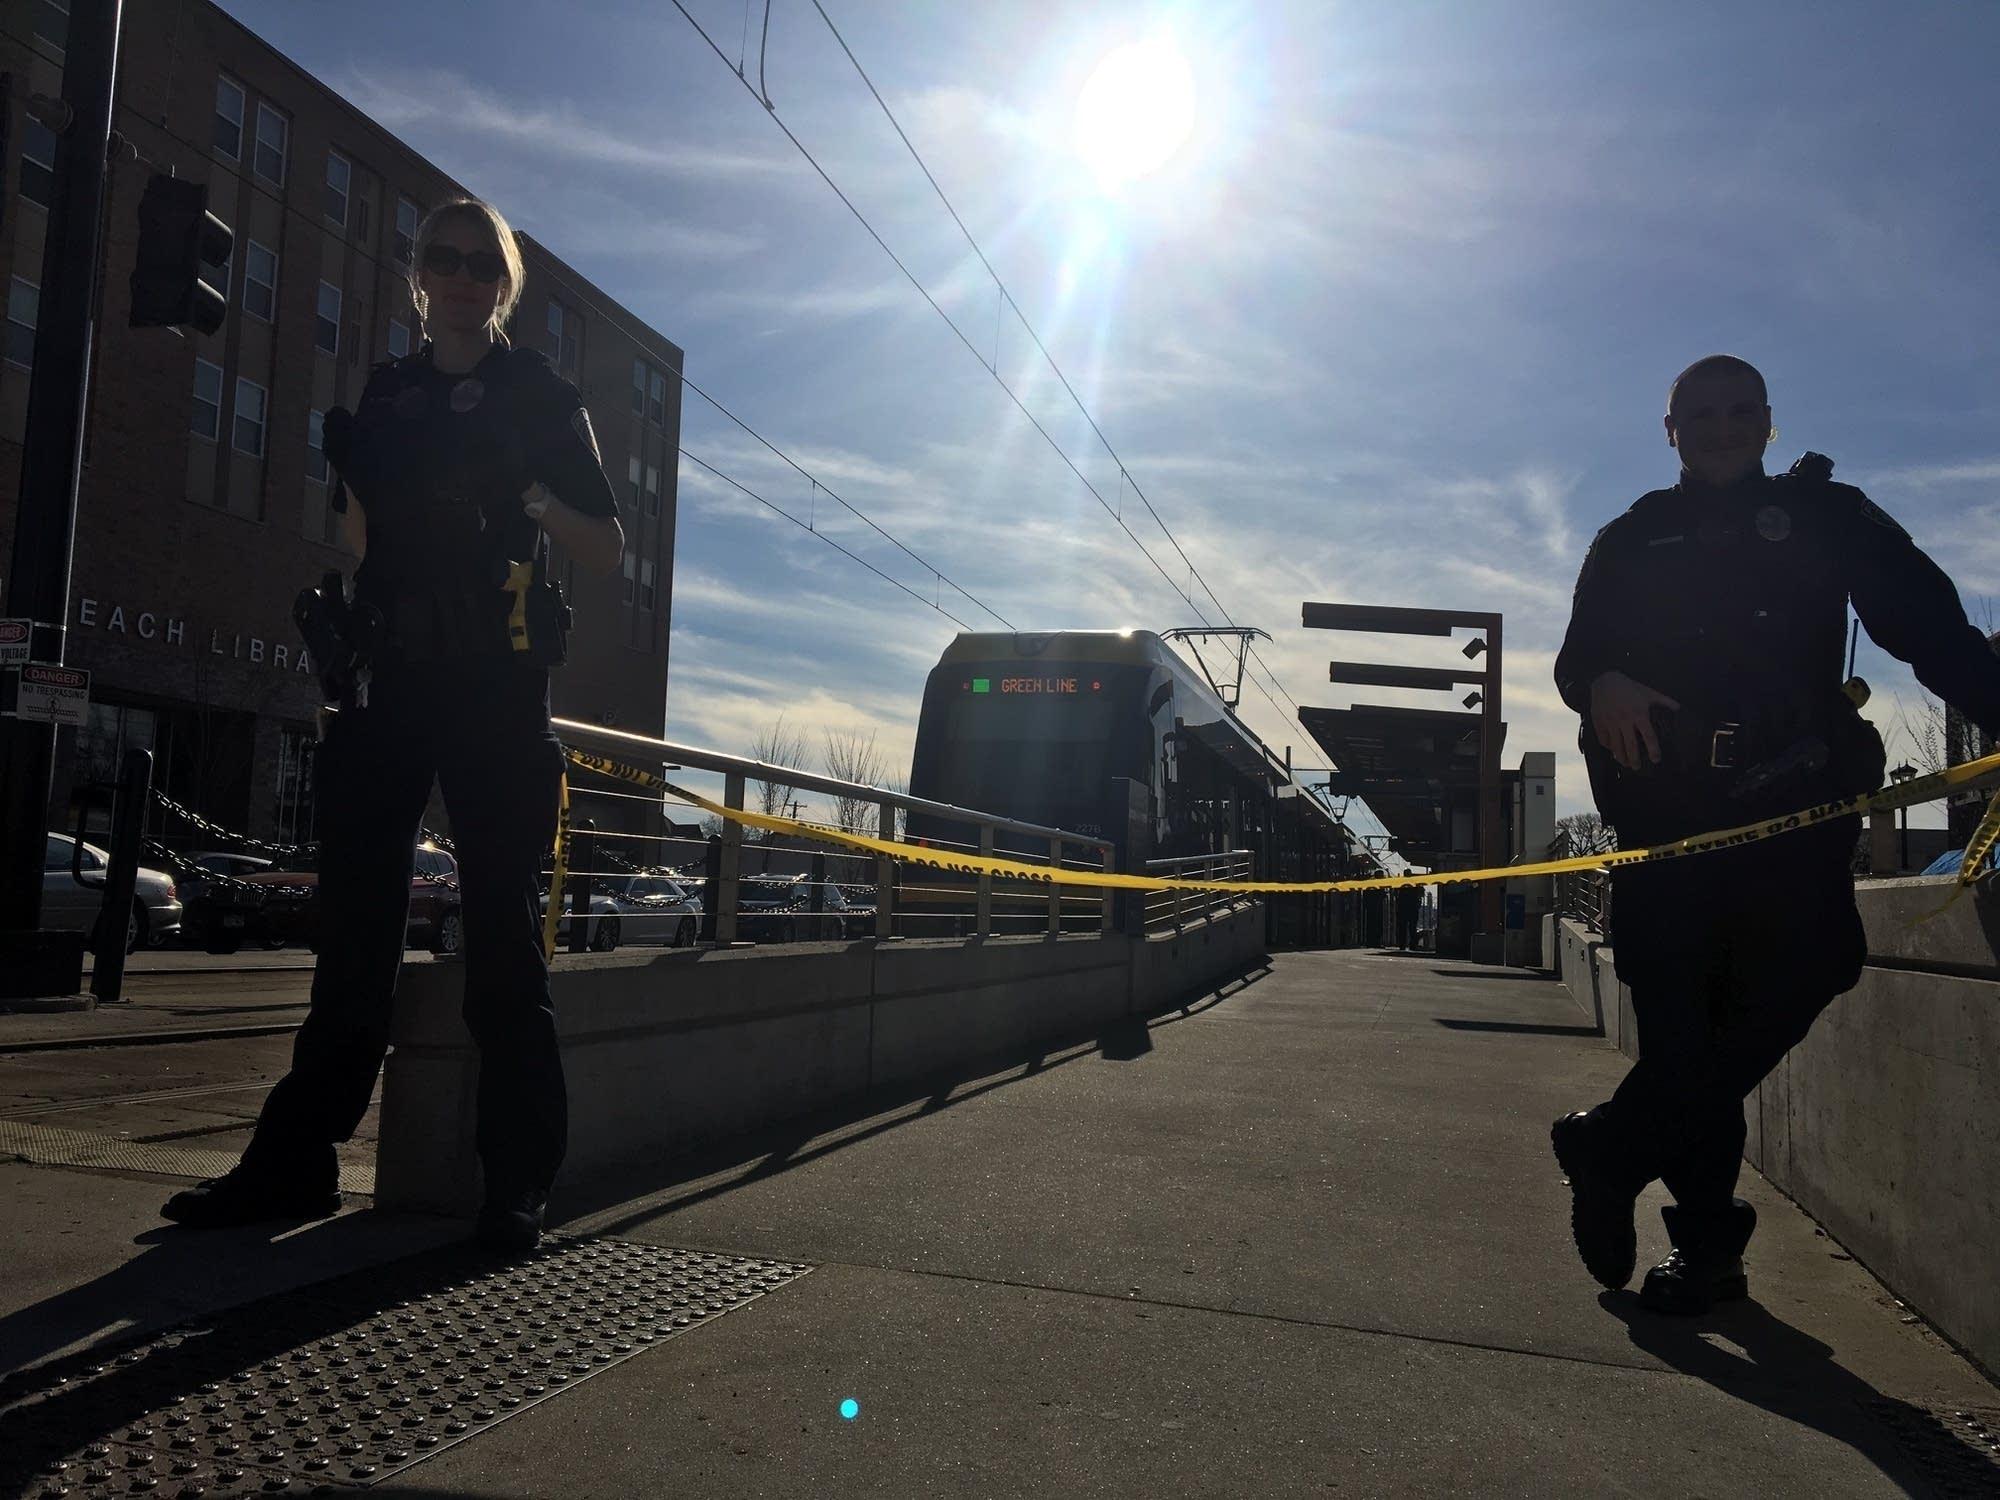 Green Line train after shots were fired